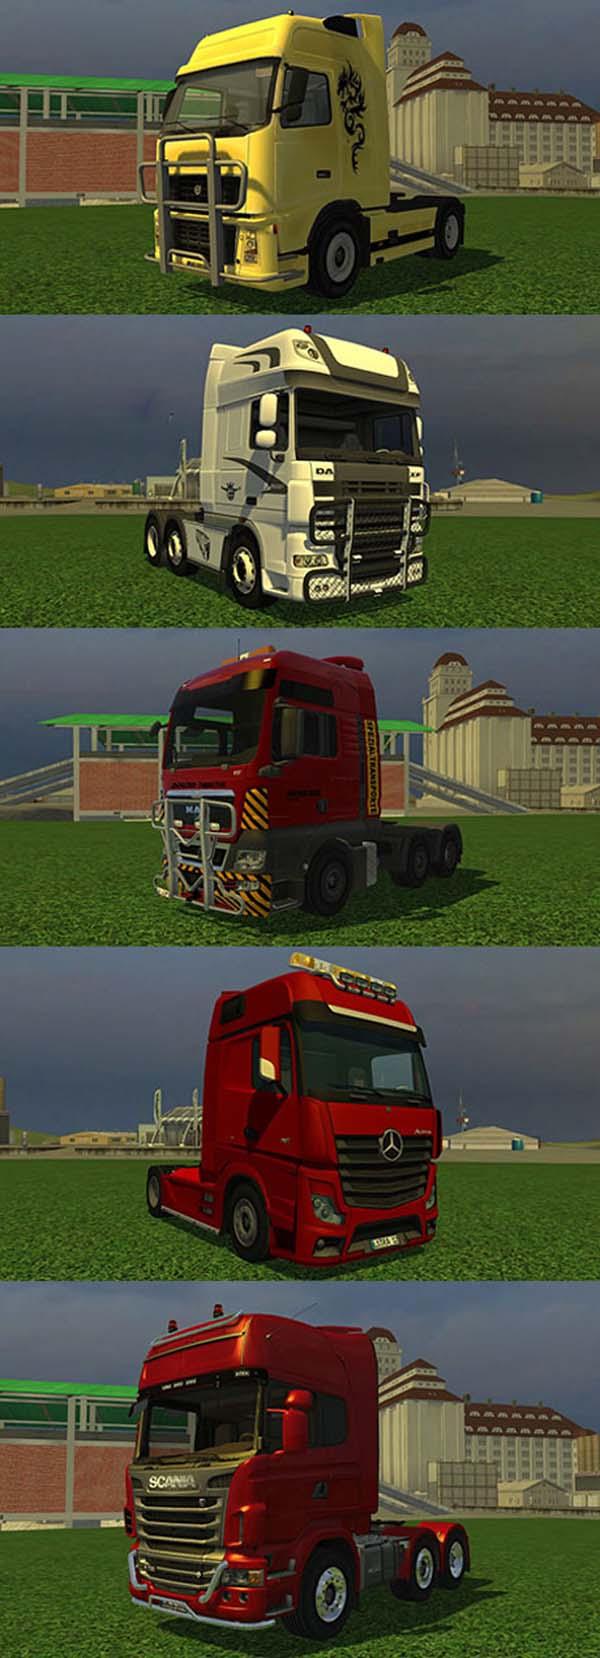 Mod camion Farming Simulator 2013 (LS Trucks Pack - Scania, Volvo, Mercedes-Benz, Man e Daf) Ls-tru10